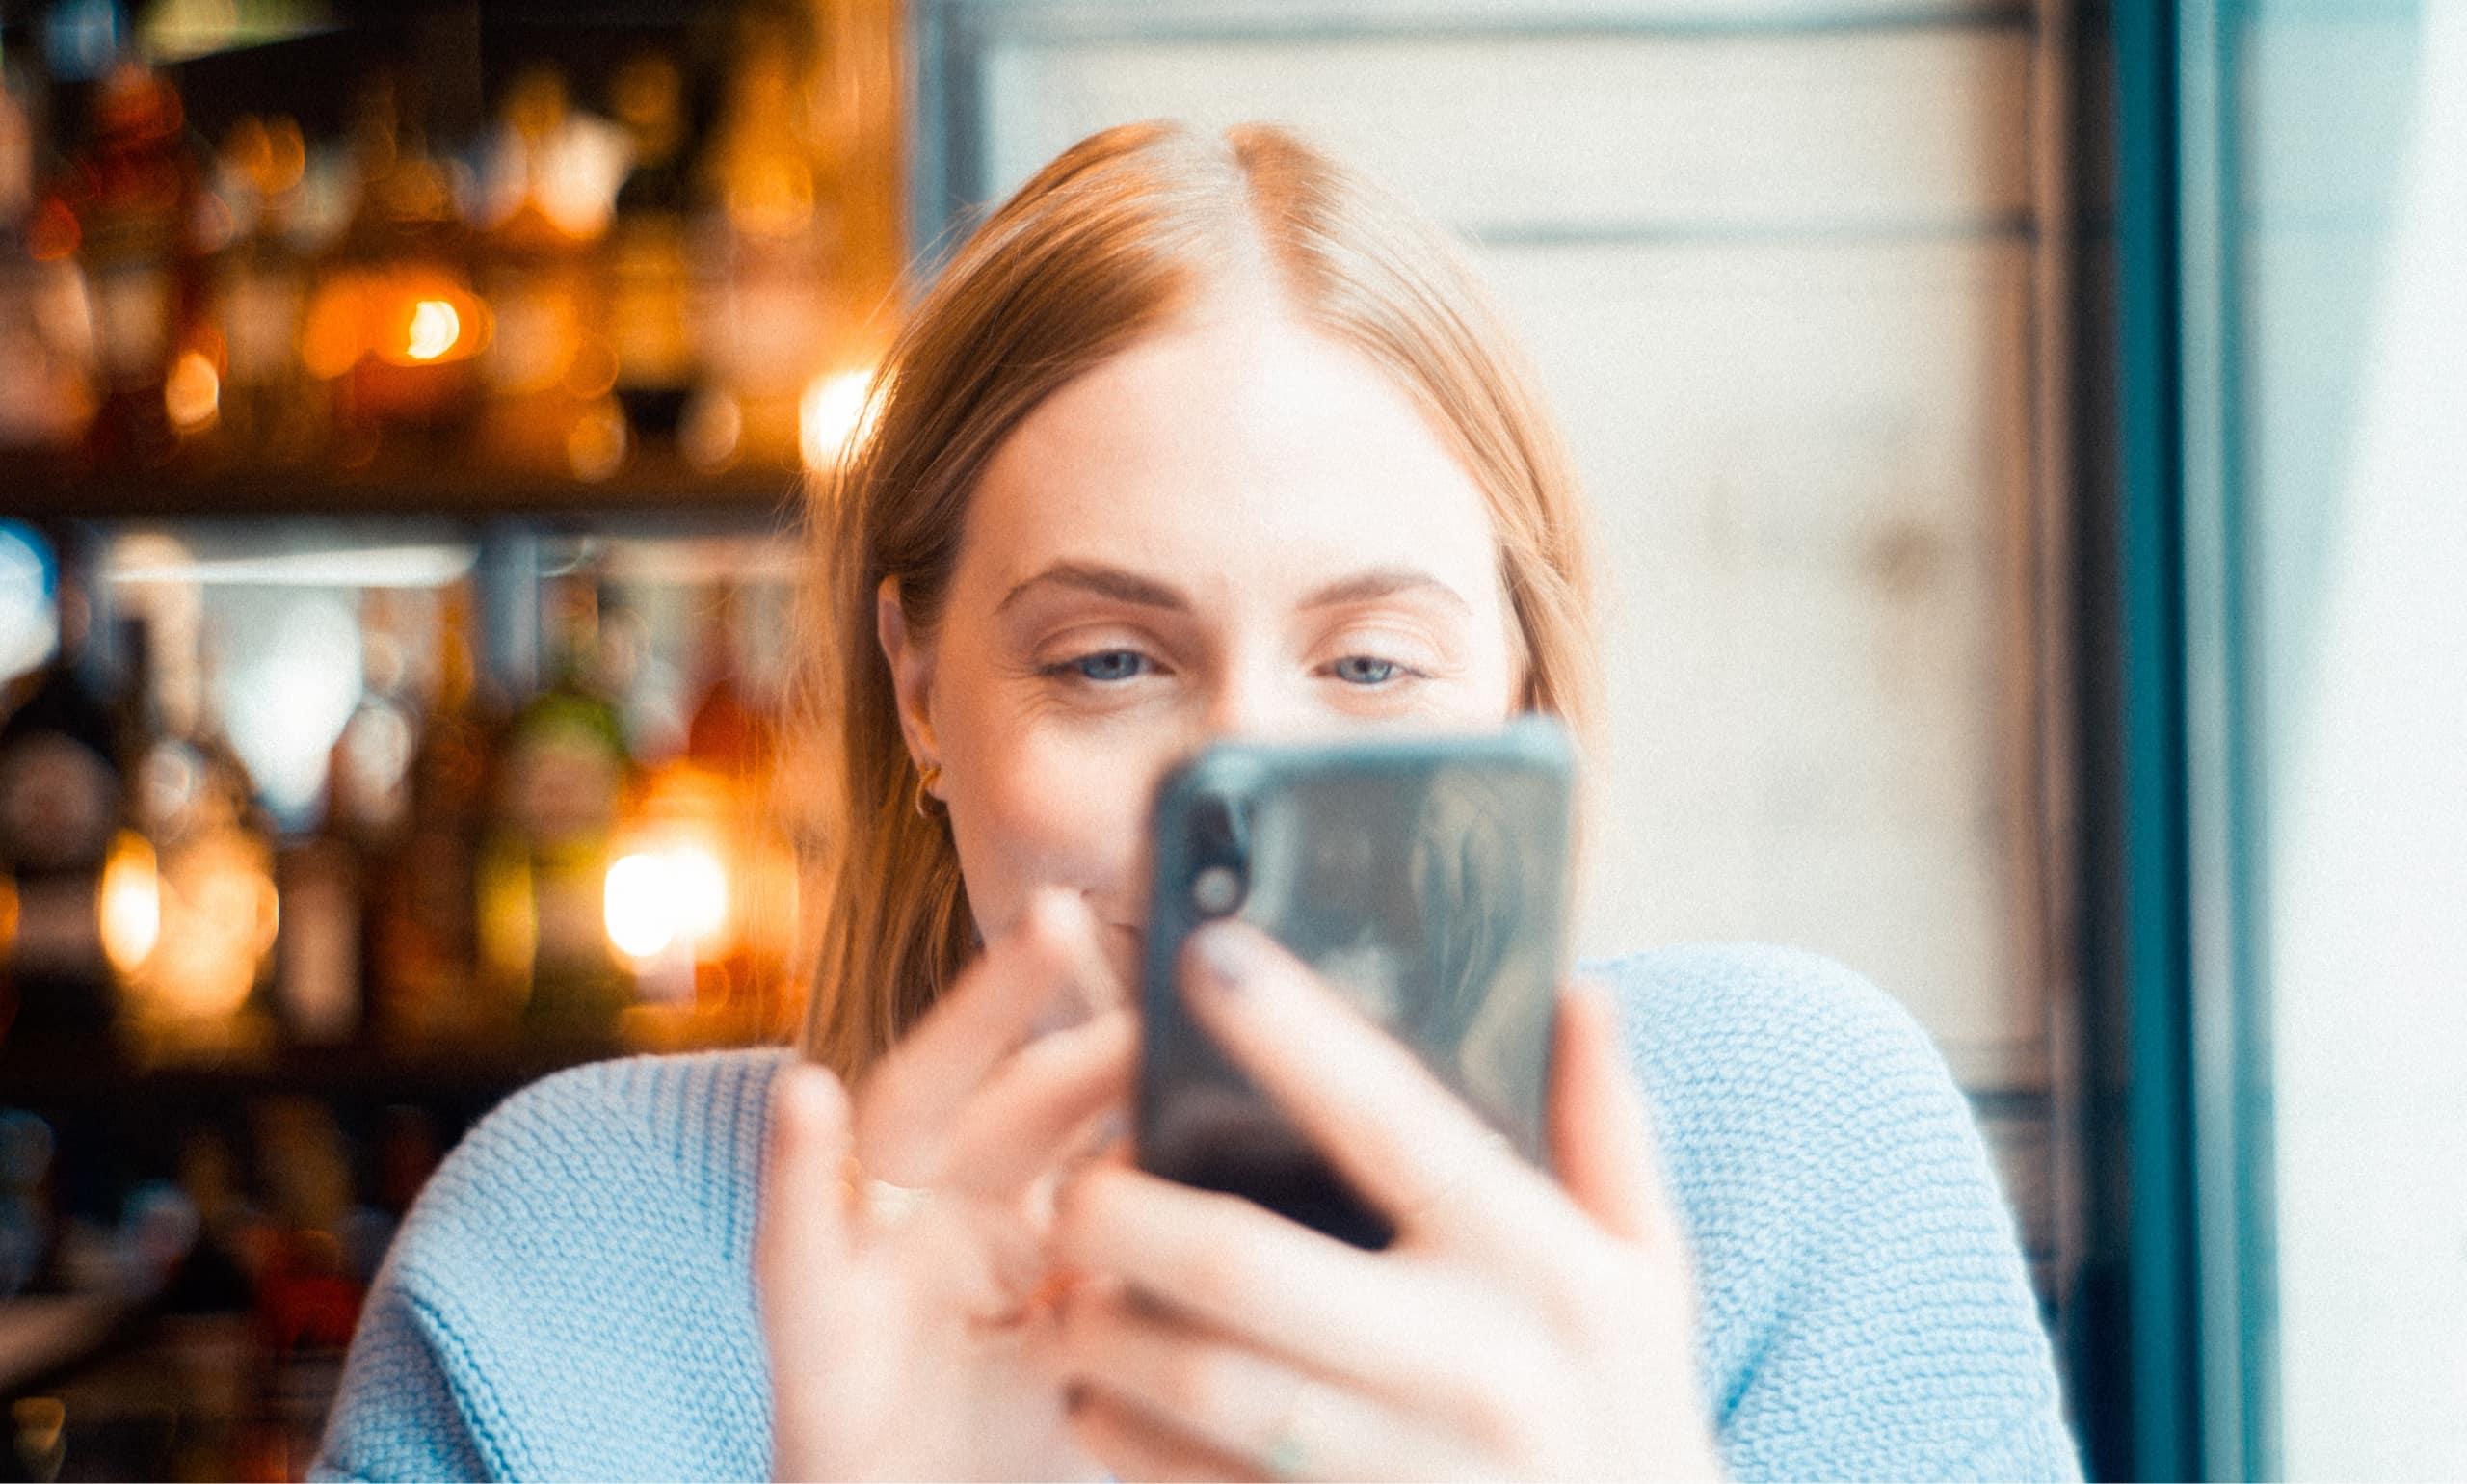 jeune femme utilisatn son téléphone portable